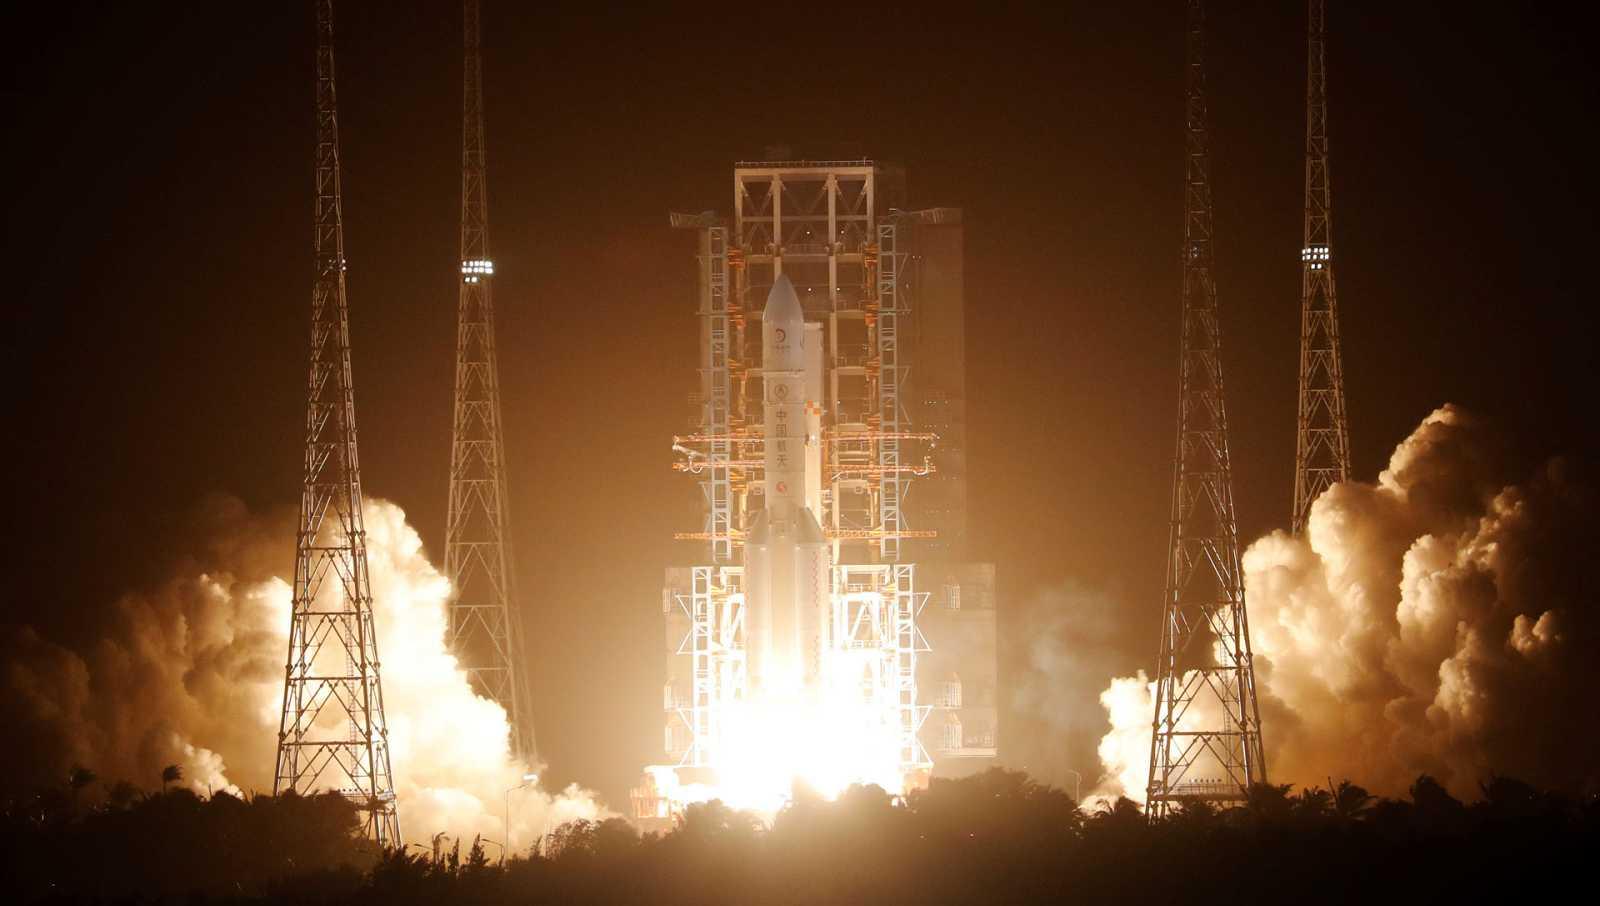 Asia hoy - Carrera espacial: China marca el ritmo - 24/11/20 - escuchar ahora